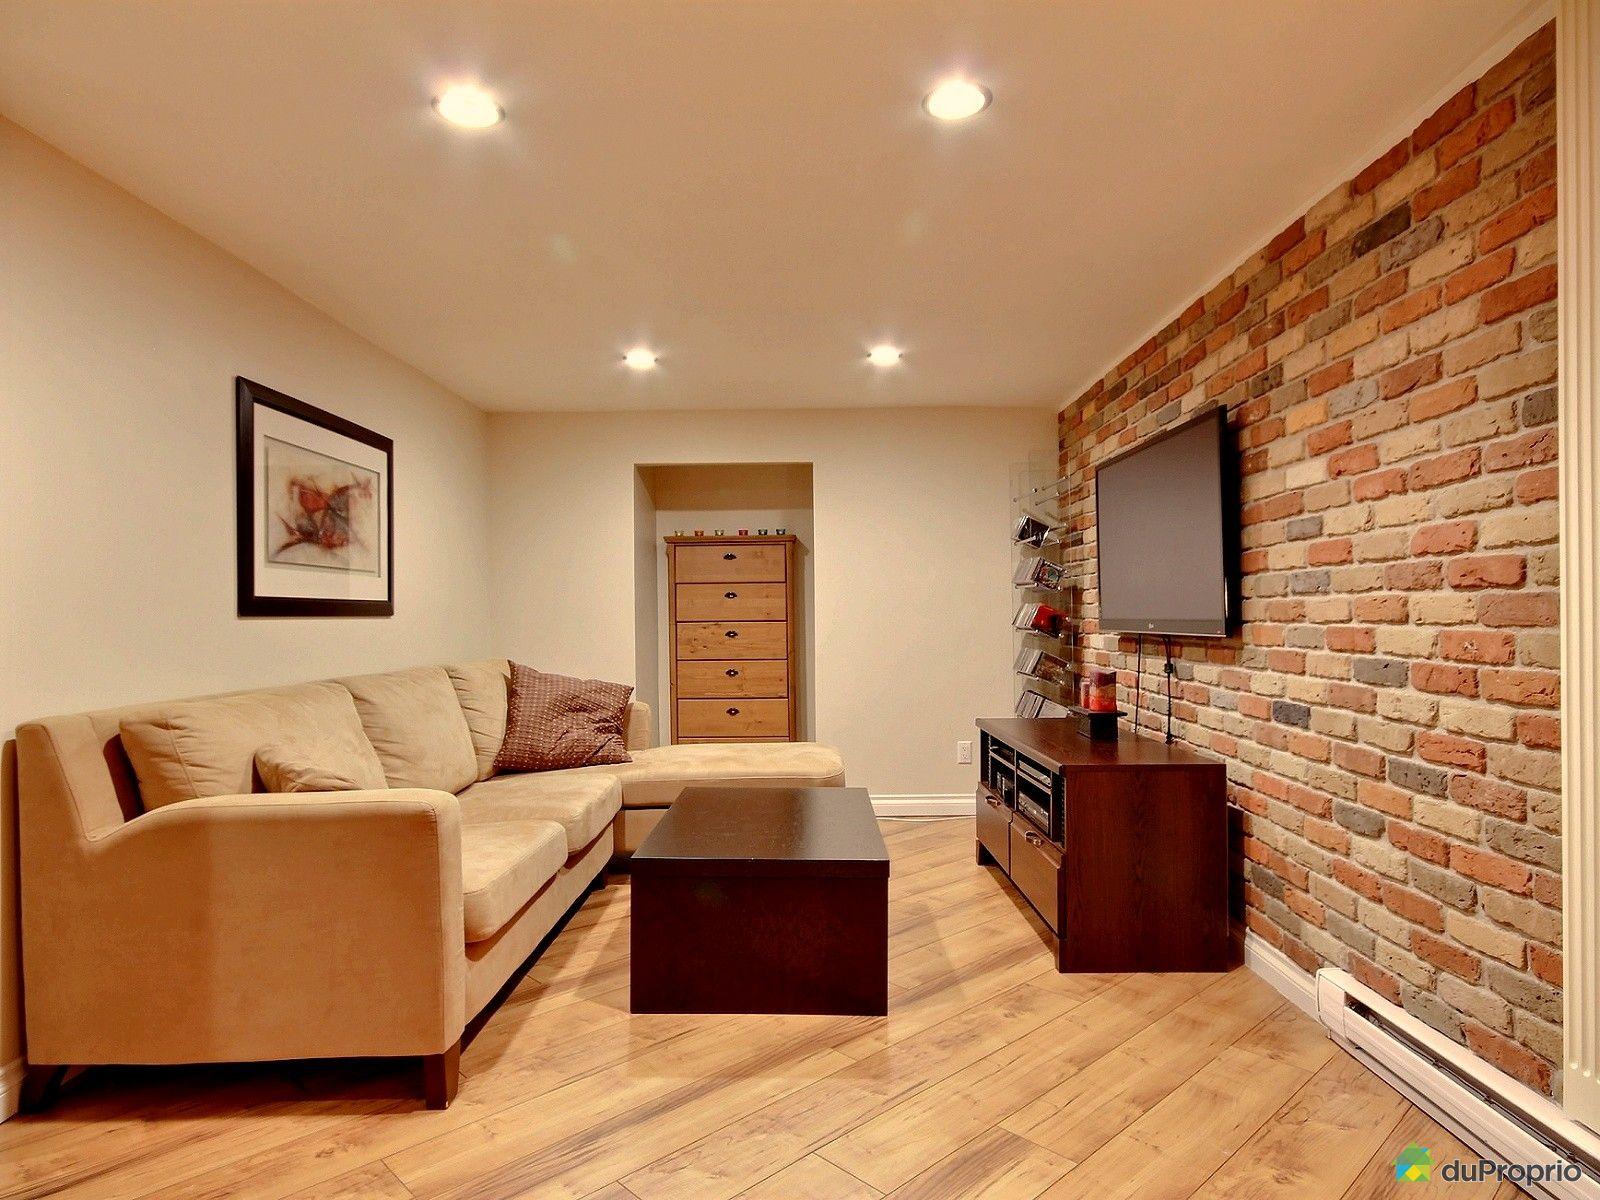 maison vendu ste therese immobilier qu bec duproprio 553523. Black Bedroom Furniture Sets. Home Design Ideas